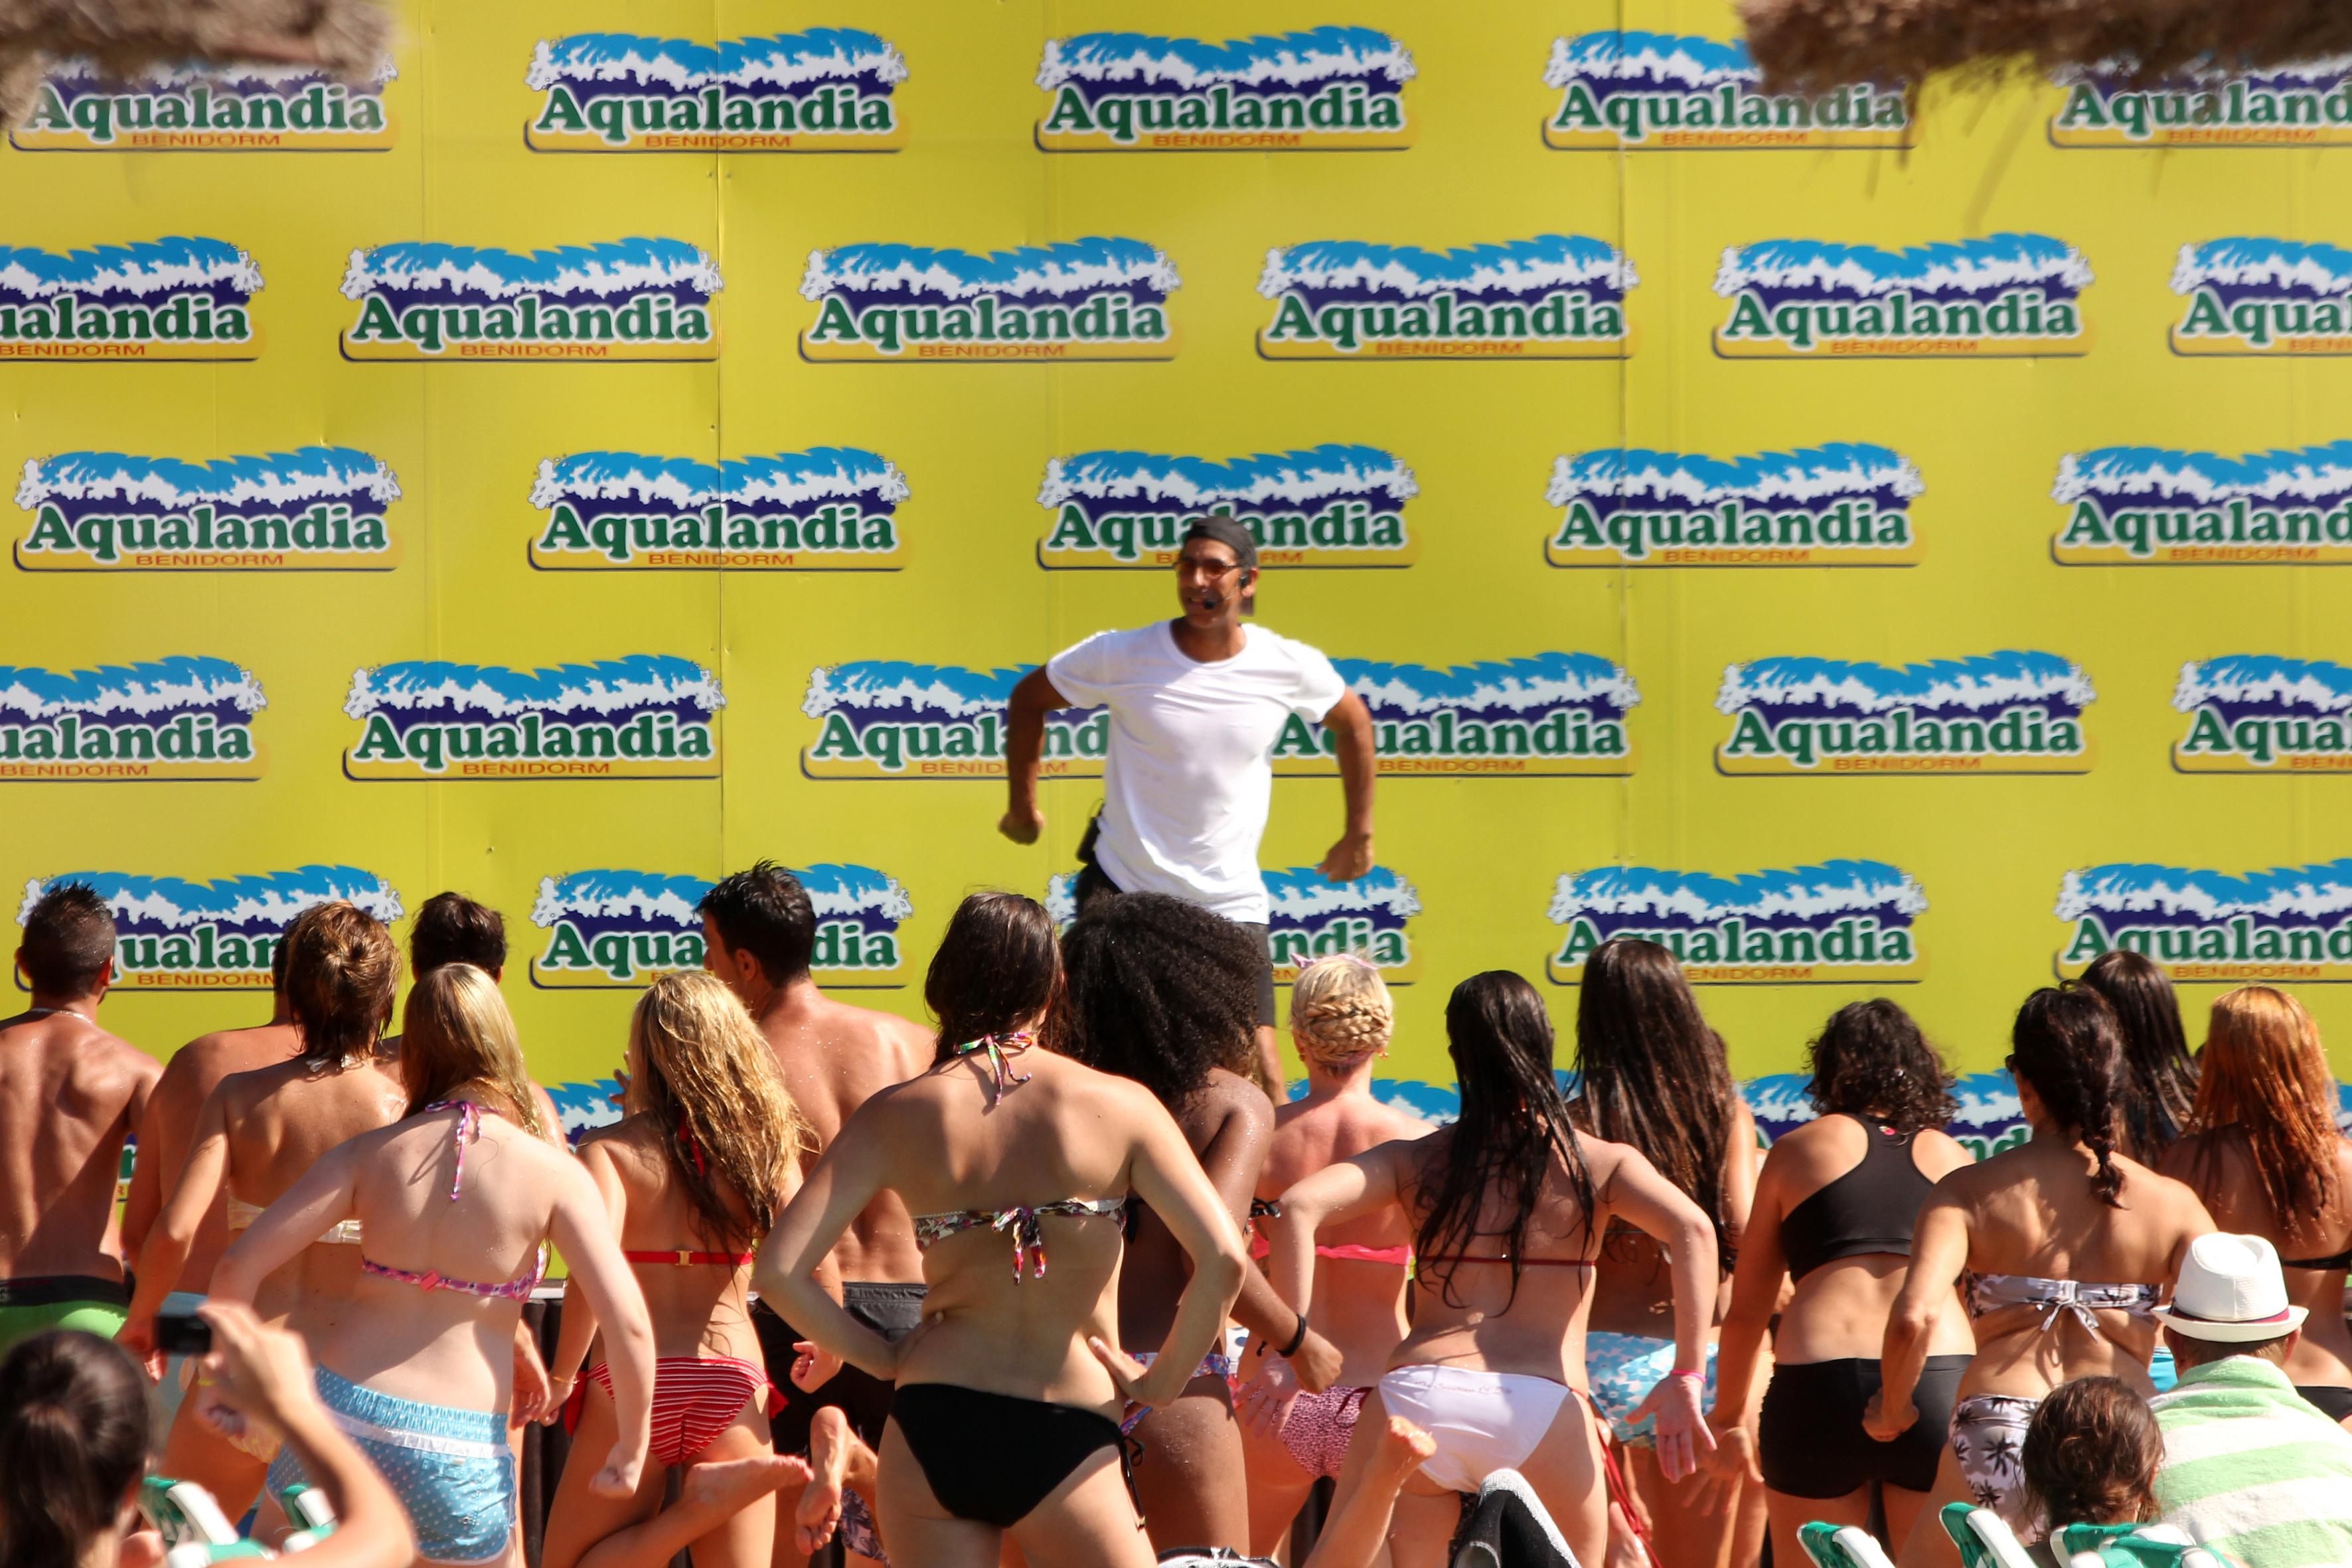 ¡Practica aerobic en Aqualandia!